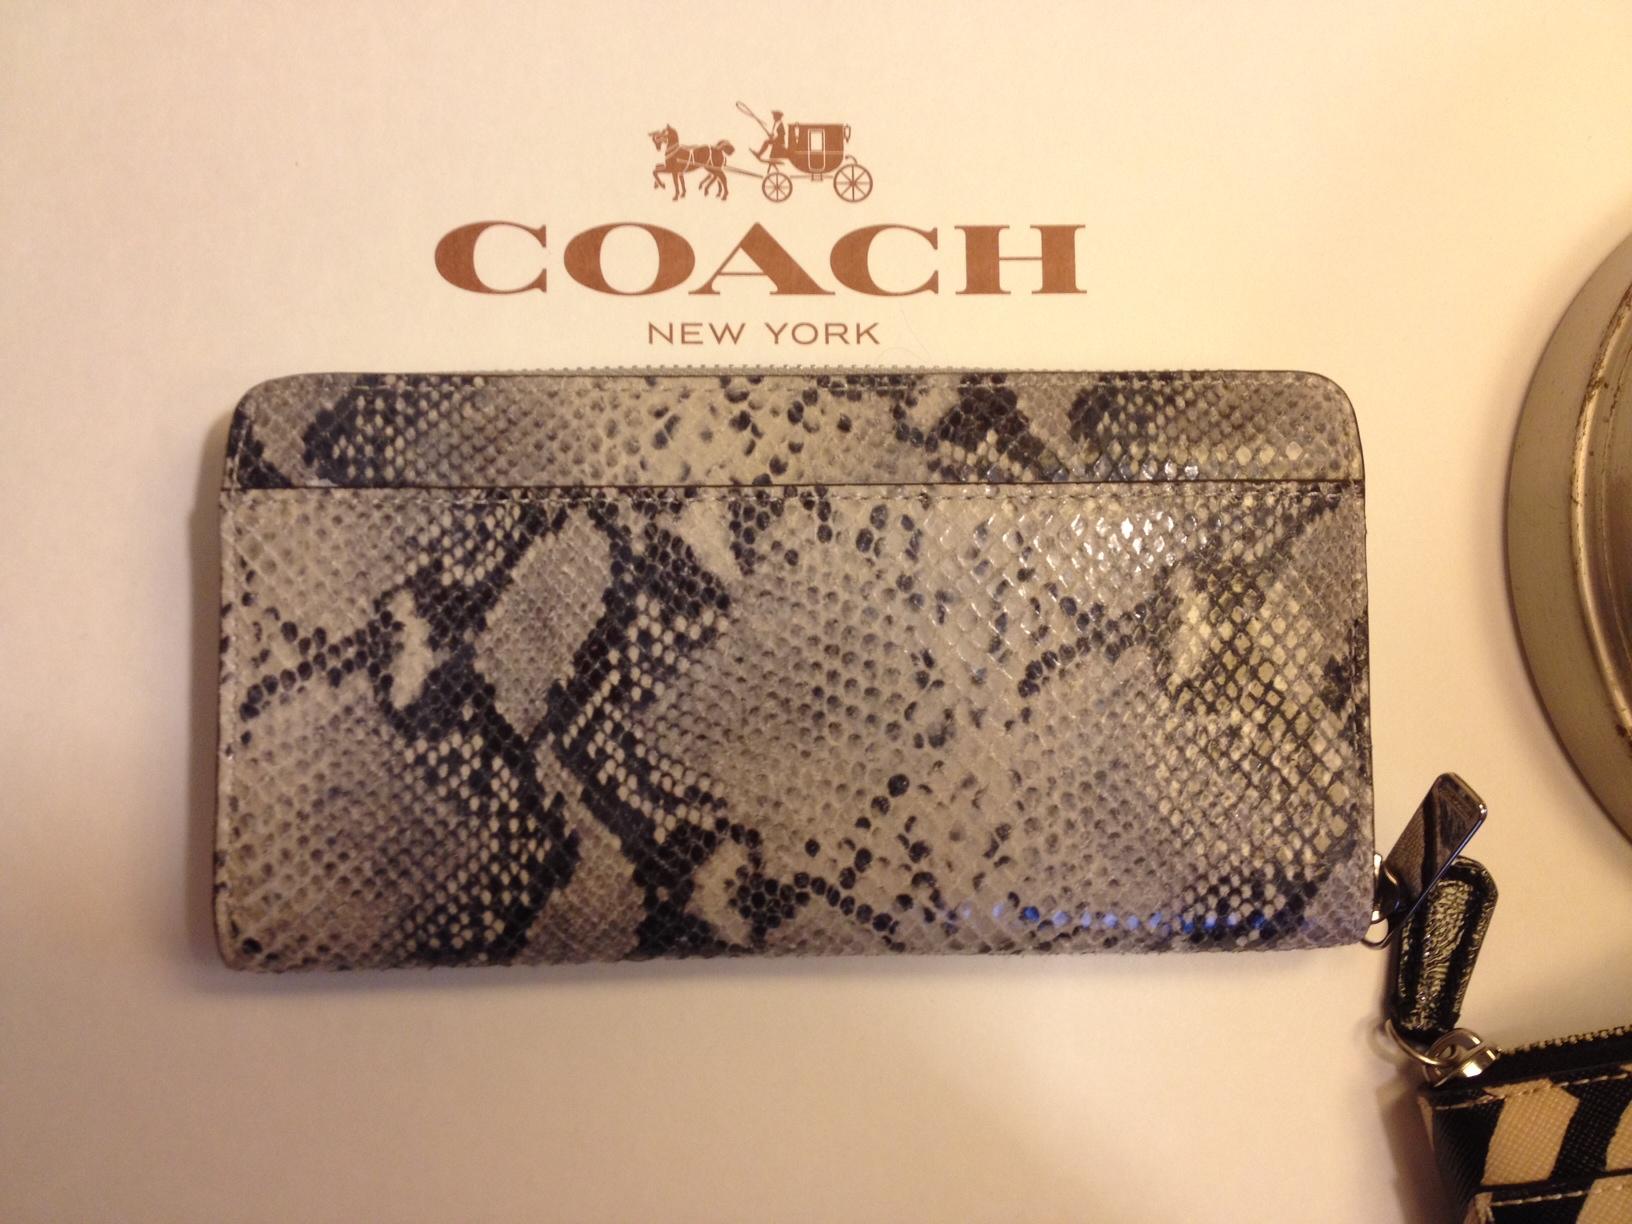 Coach replica wallets